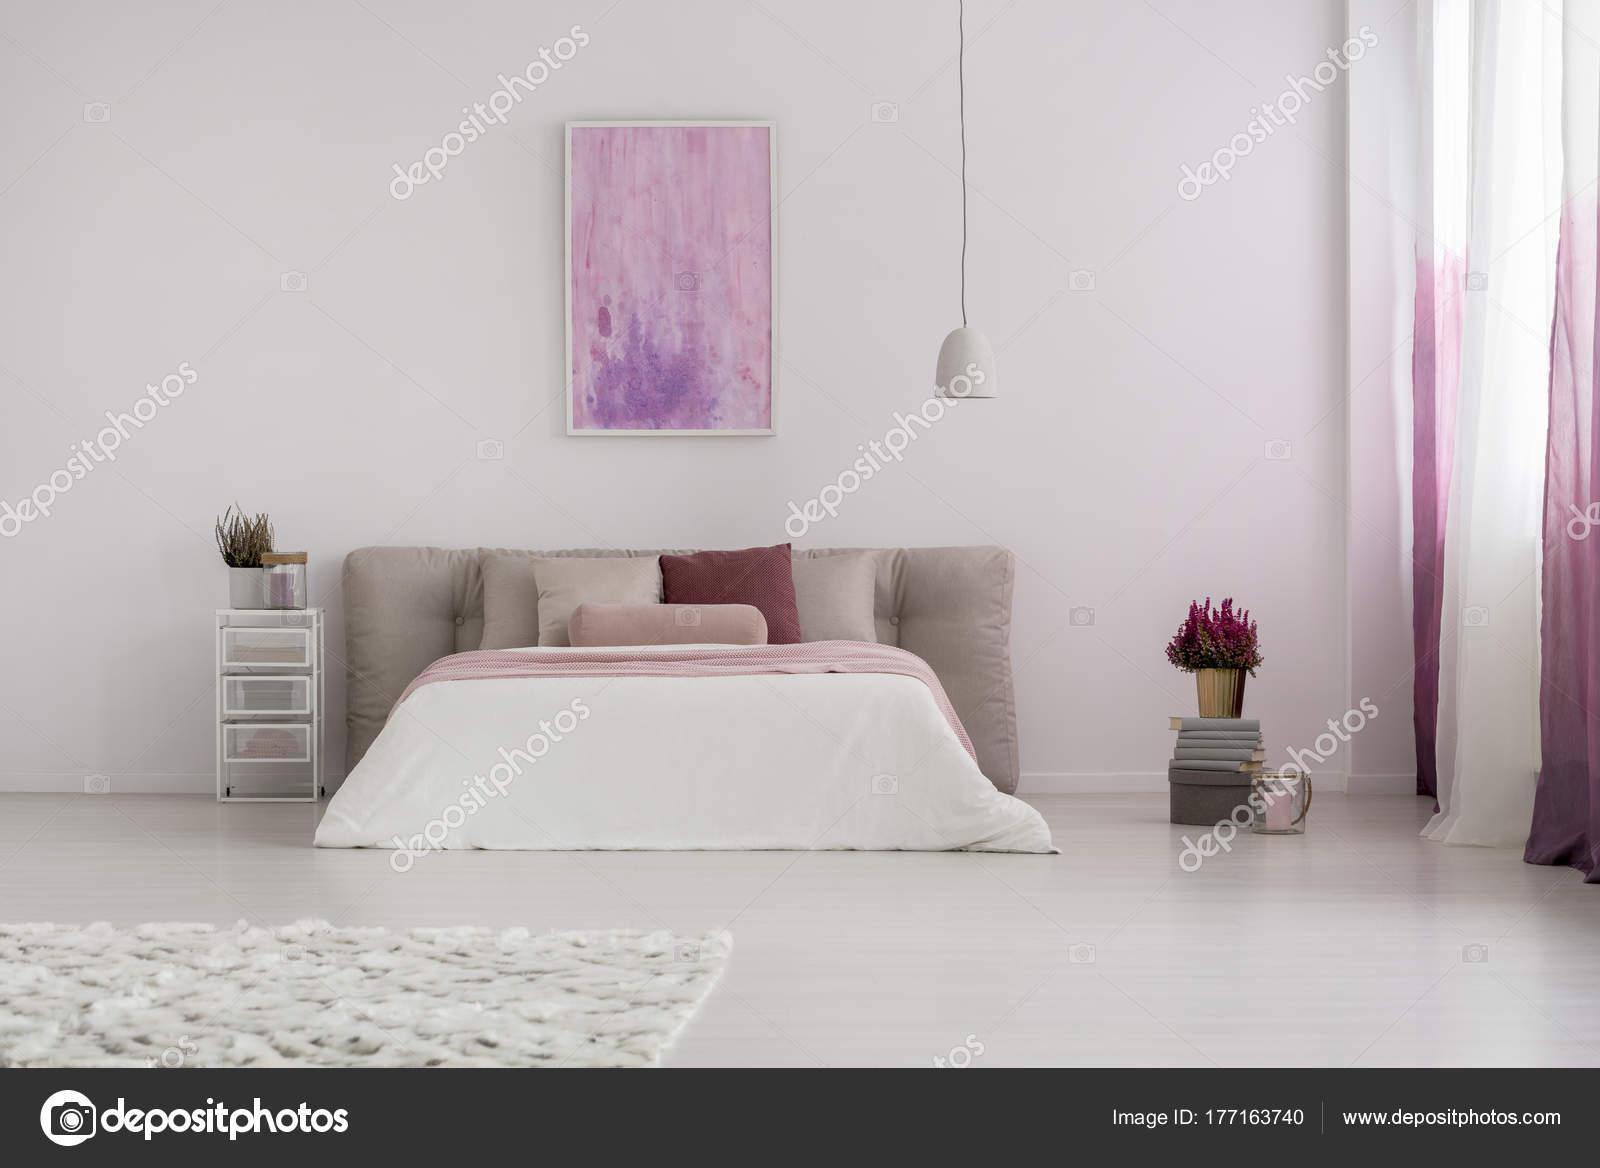 Roze Slaapkamer Lamp : Roze schilderij in ruime slaapkamer u stockfoto photographee eu